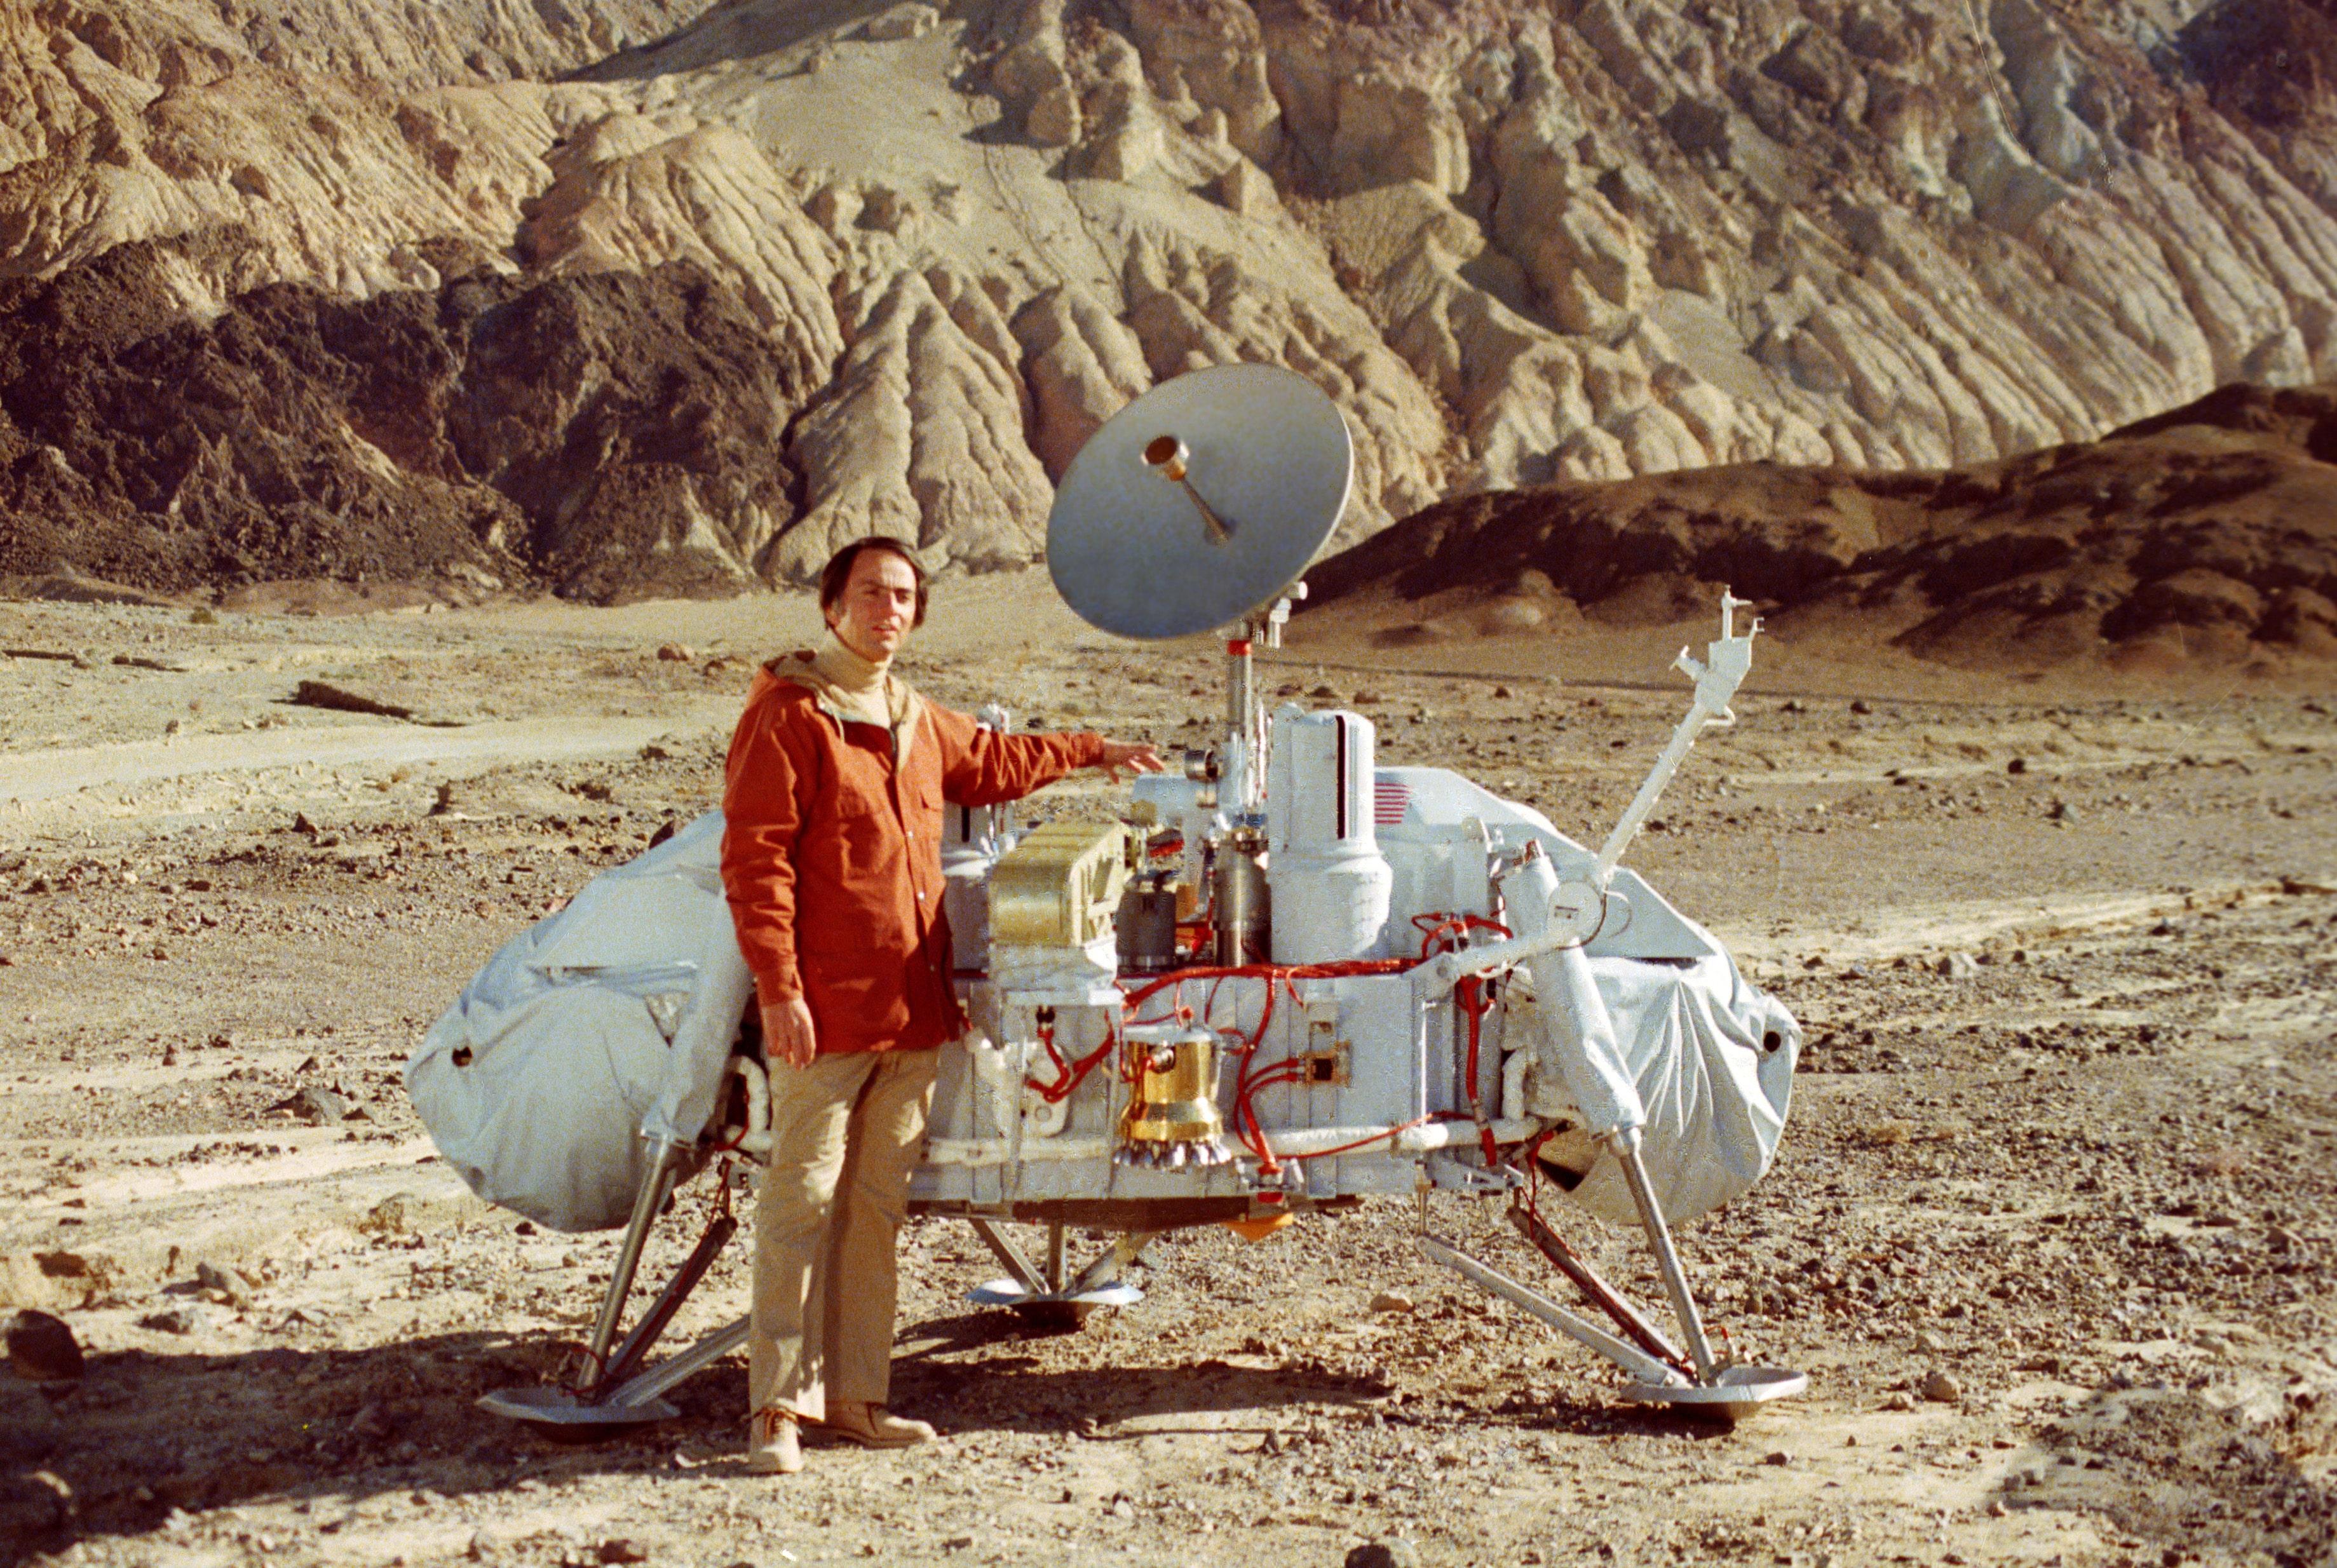 La huella de Carl Sagan